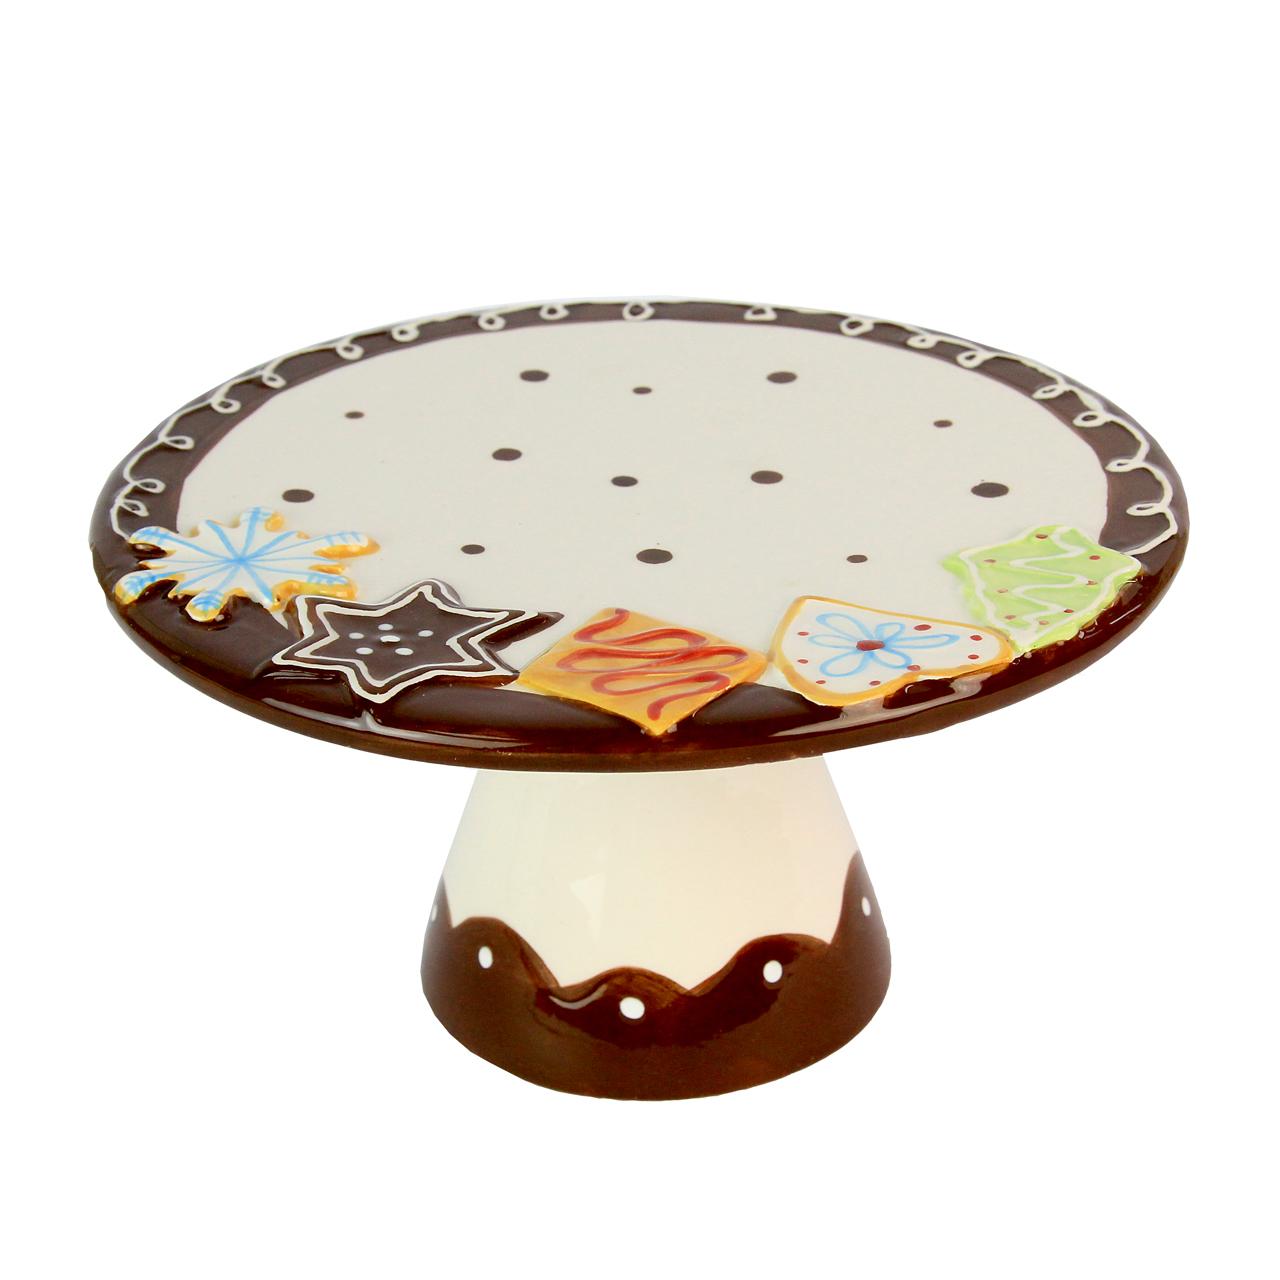 Platou Cu Picior Din Ceramica Alb Cu Maro Pentru P